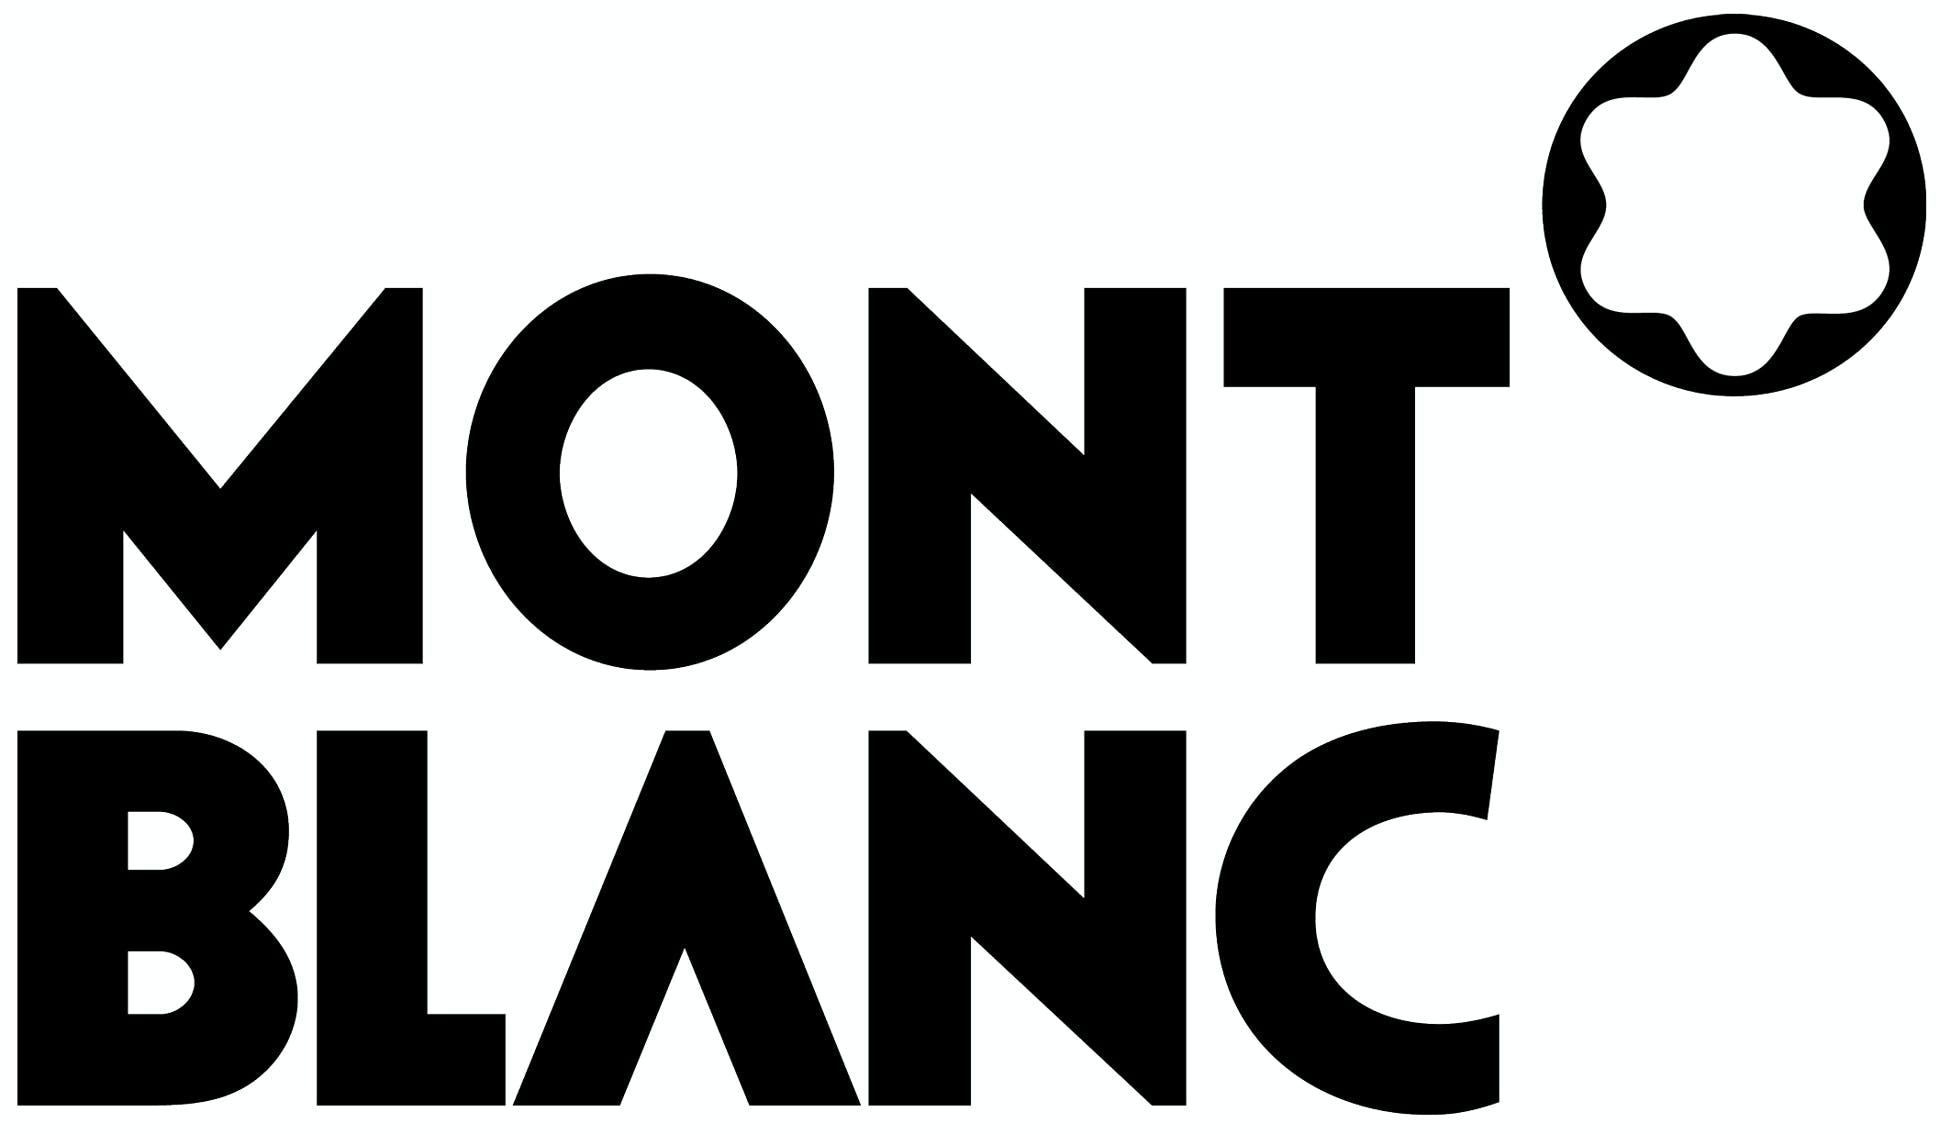 The Montblanc logo